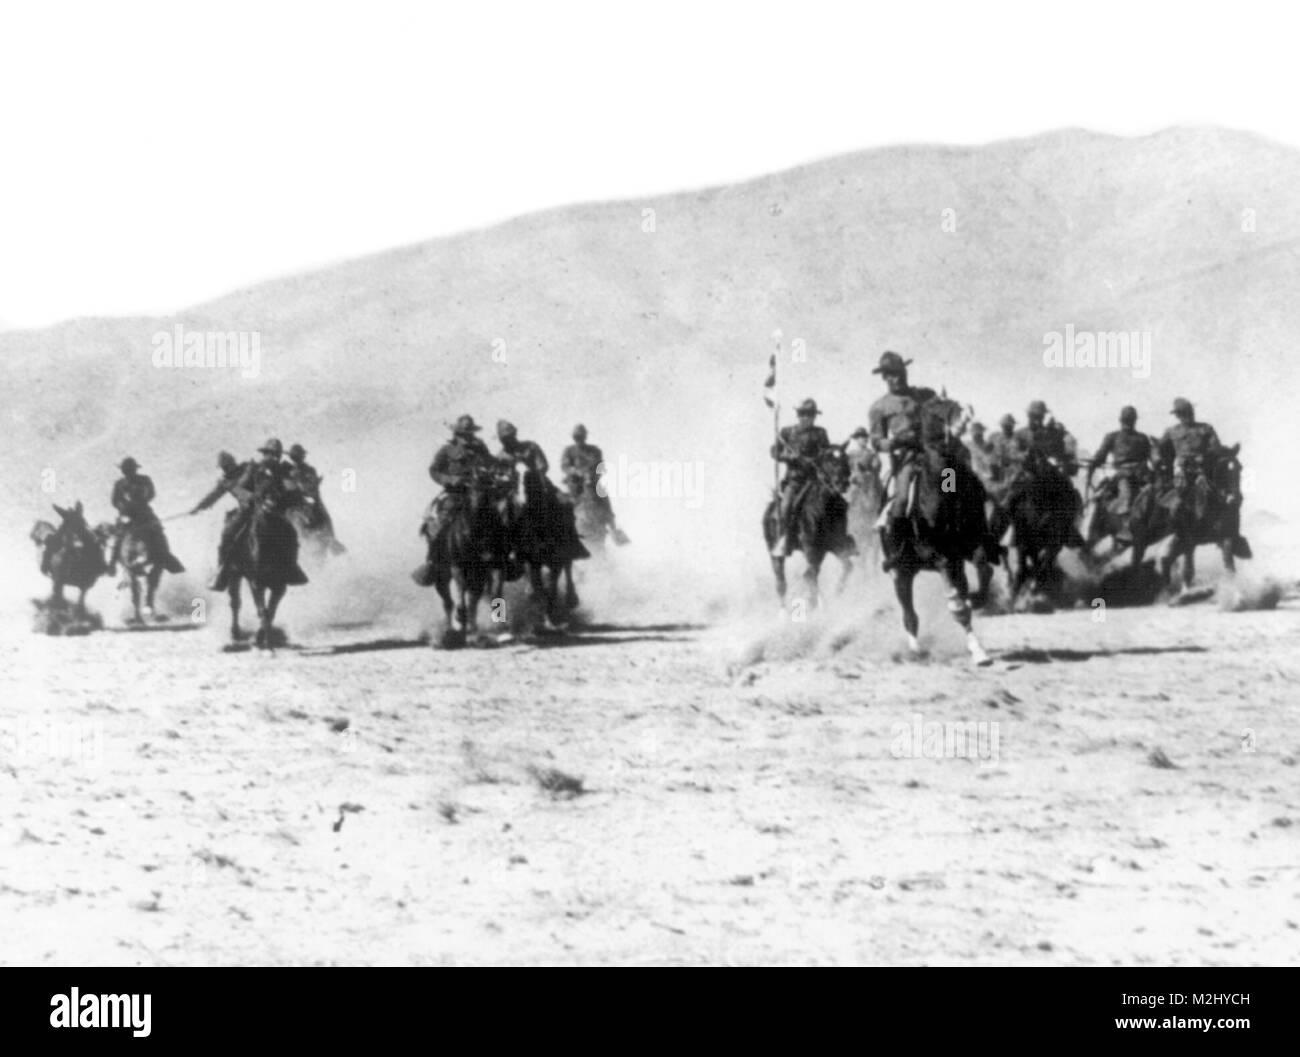 Pancho Villa Expedition, 8th Gun Cavalry, 1916 - Stock Image